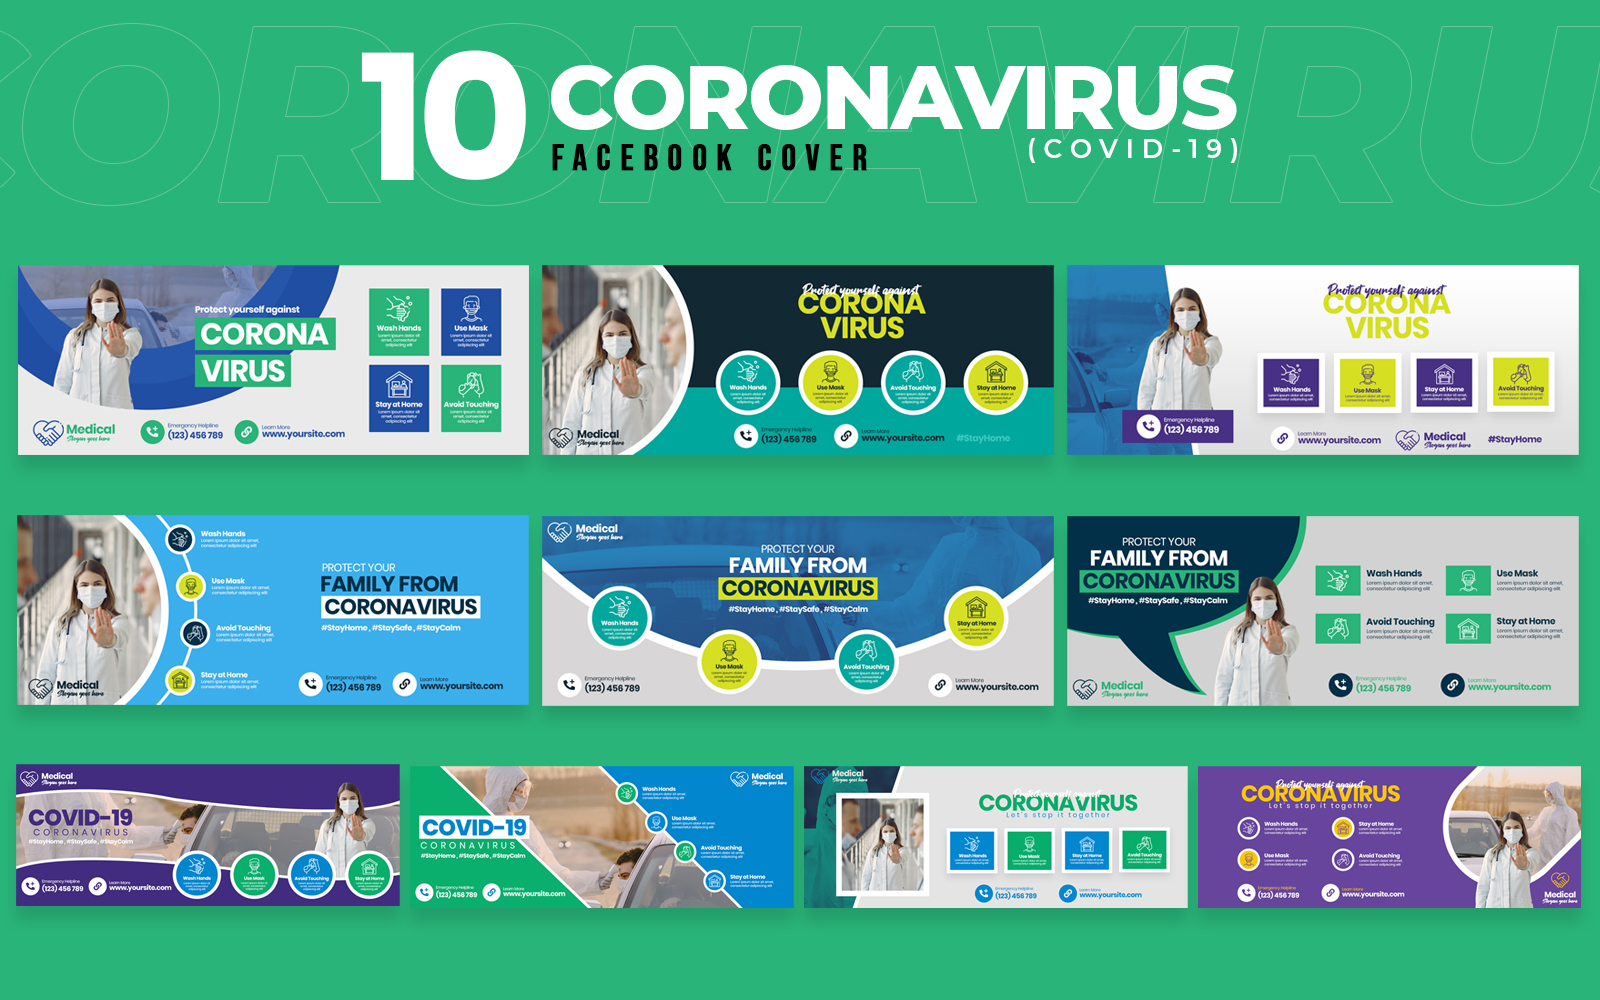 Covid-19 & Coronavirus 10 Facebook Cover Social Media